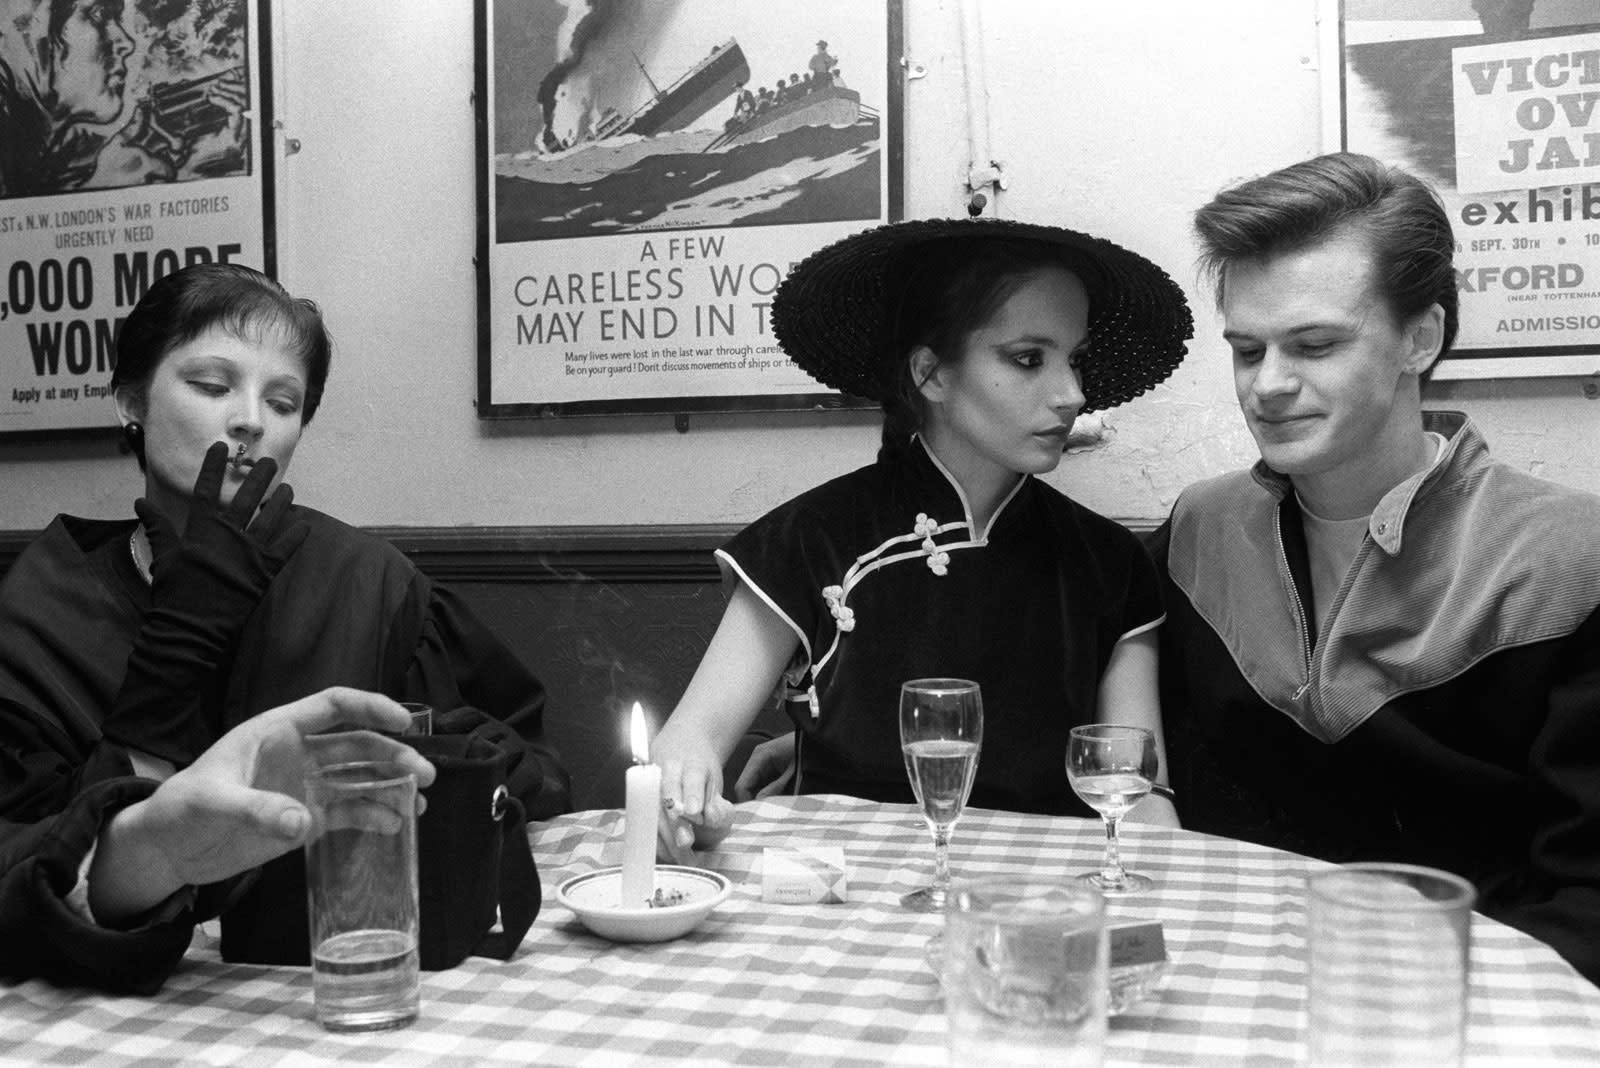 Homer Sykes, Blitz Club Kids, New Romantics, London, 1980